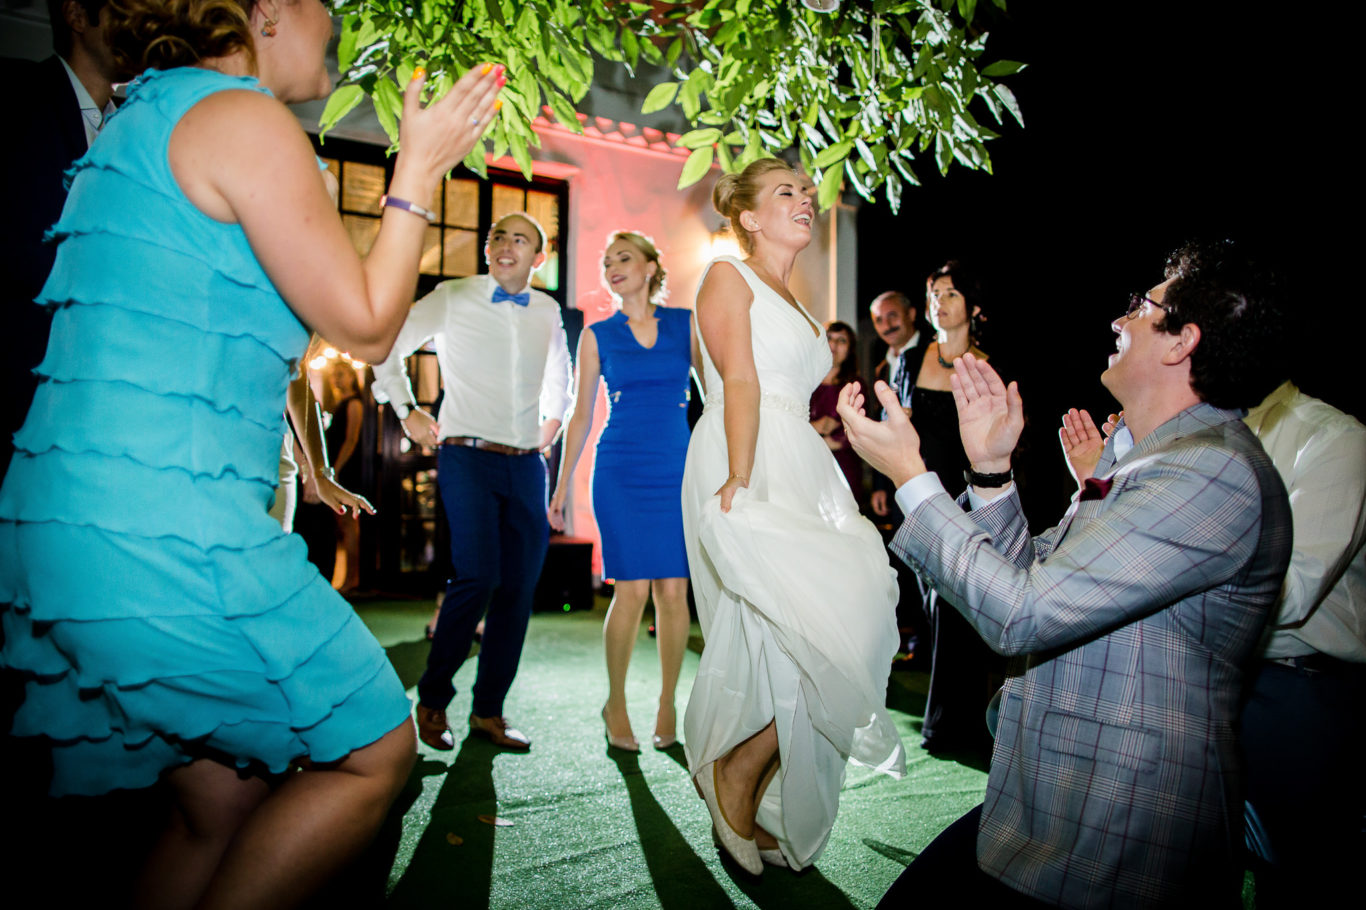 0699-fotoreportaj-nunta-conacul-maldar-cristina-stefan-fotograf-ciprian-dumitrescu-dc1_3156